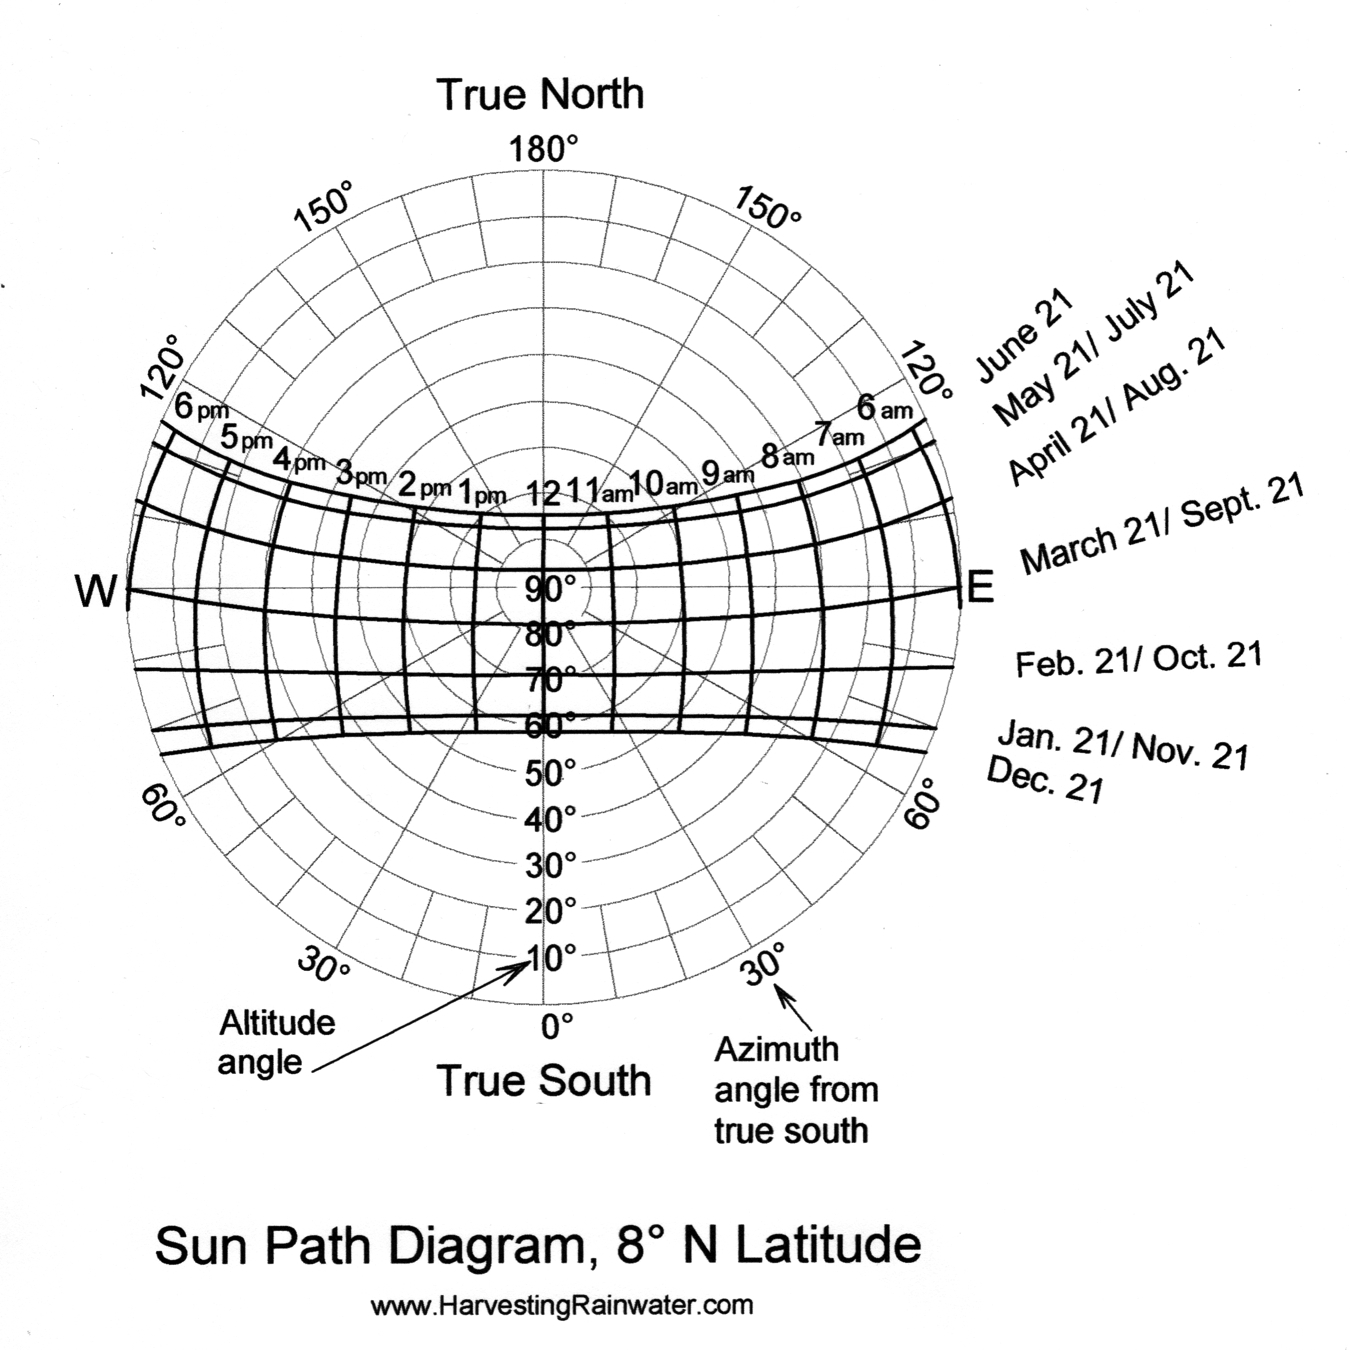 Sun Path Diagram 8o N Latitude